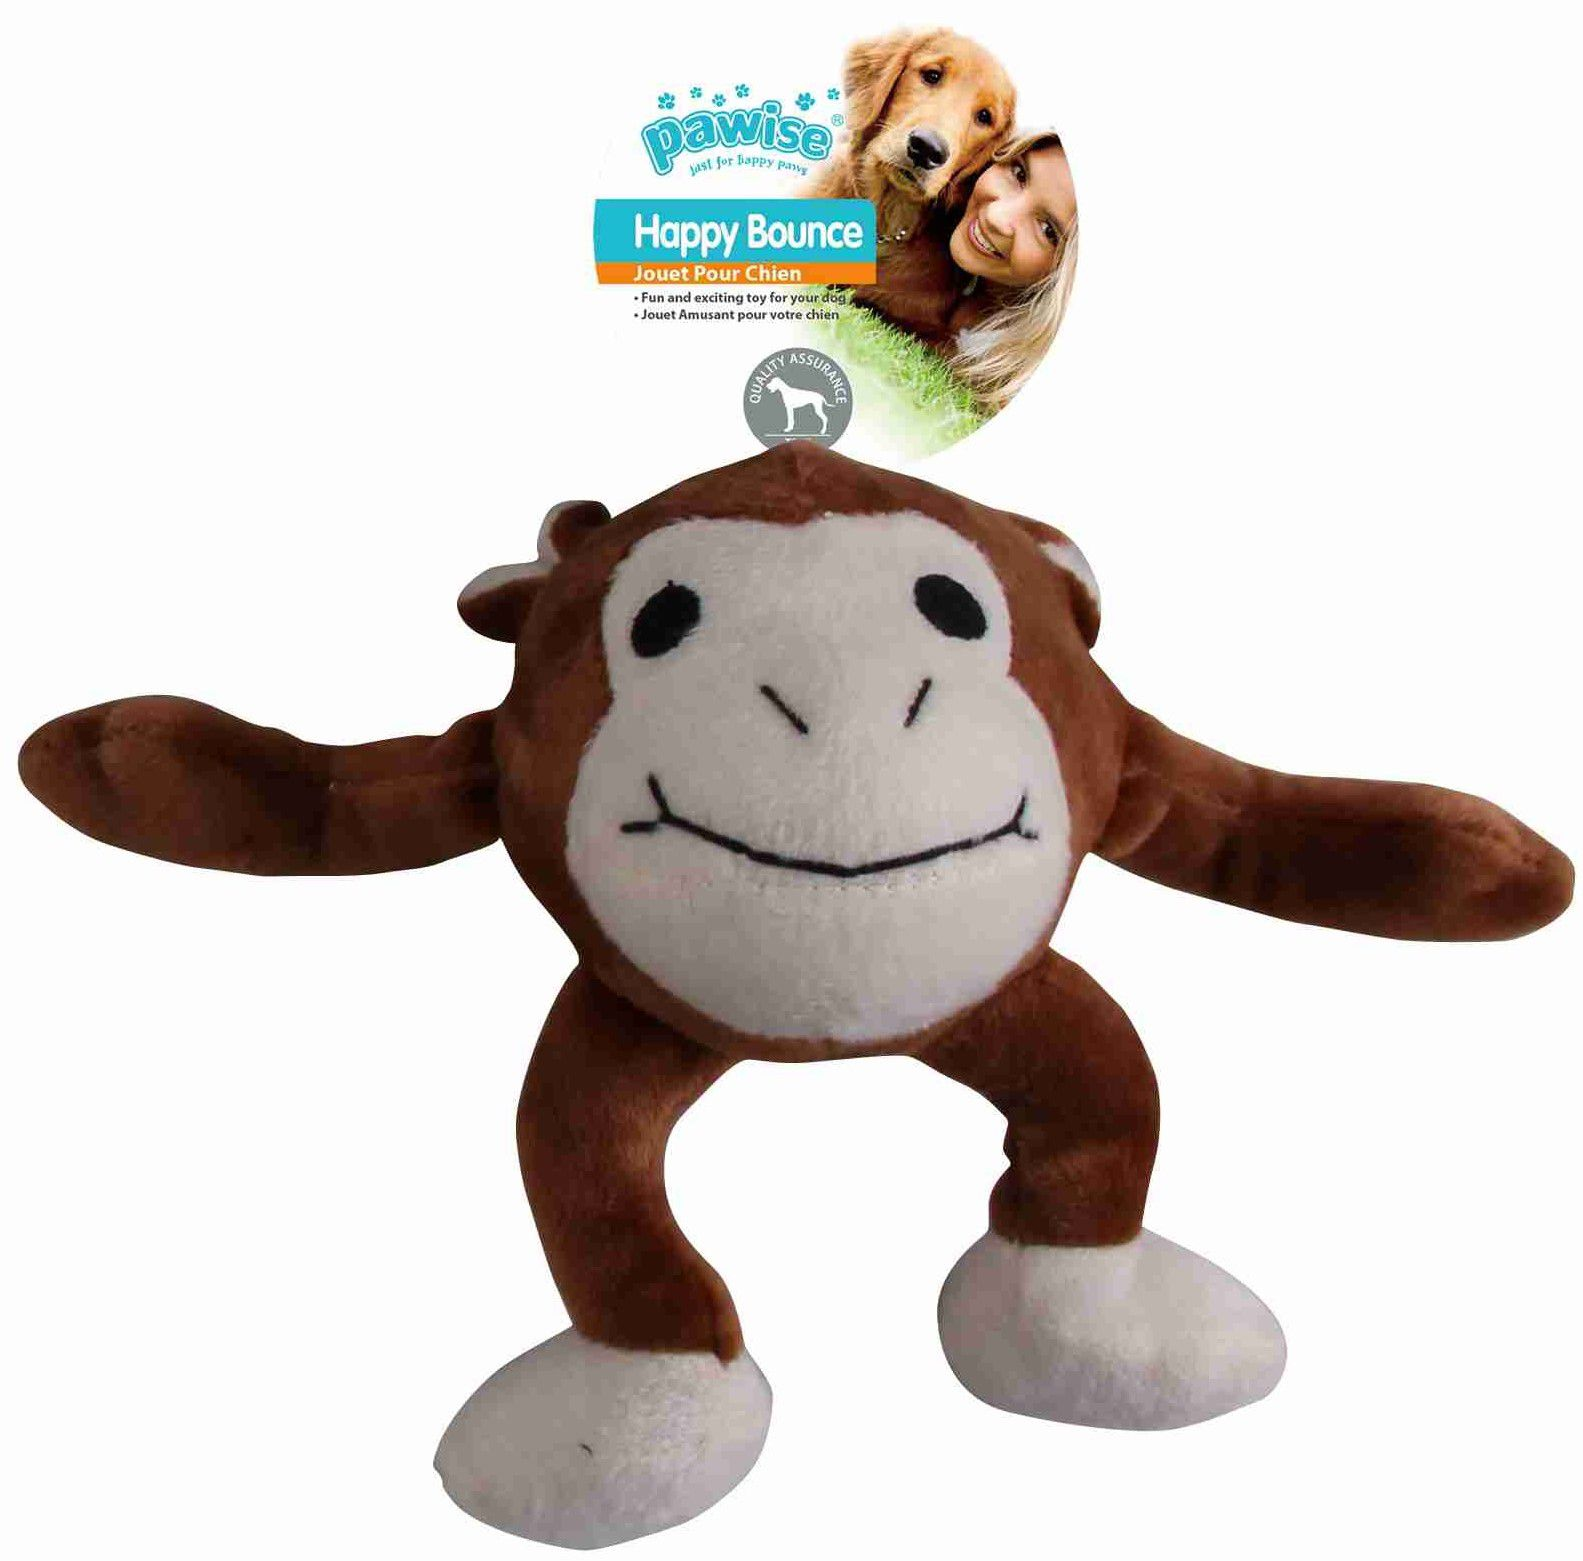 Brinquedo de pelúcia bola saltitante Macaco G Pawise